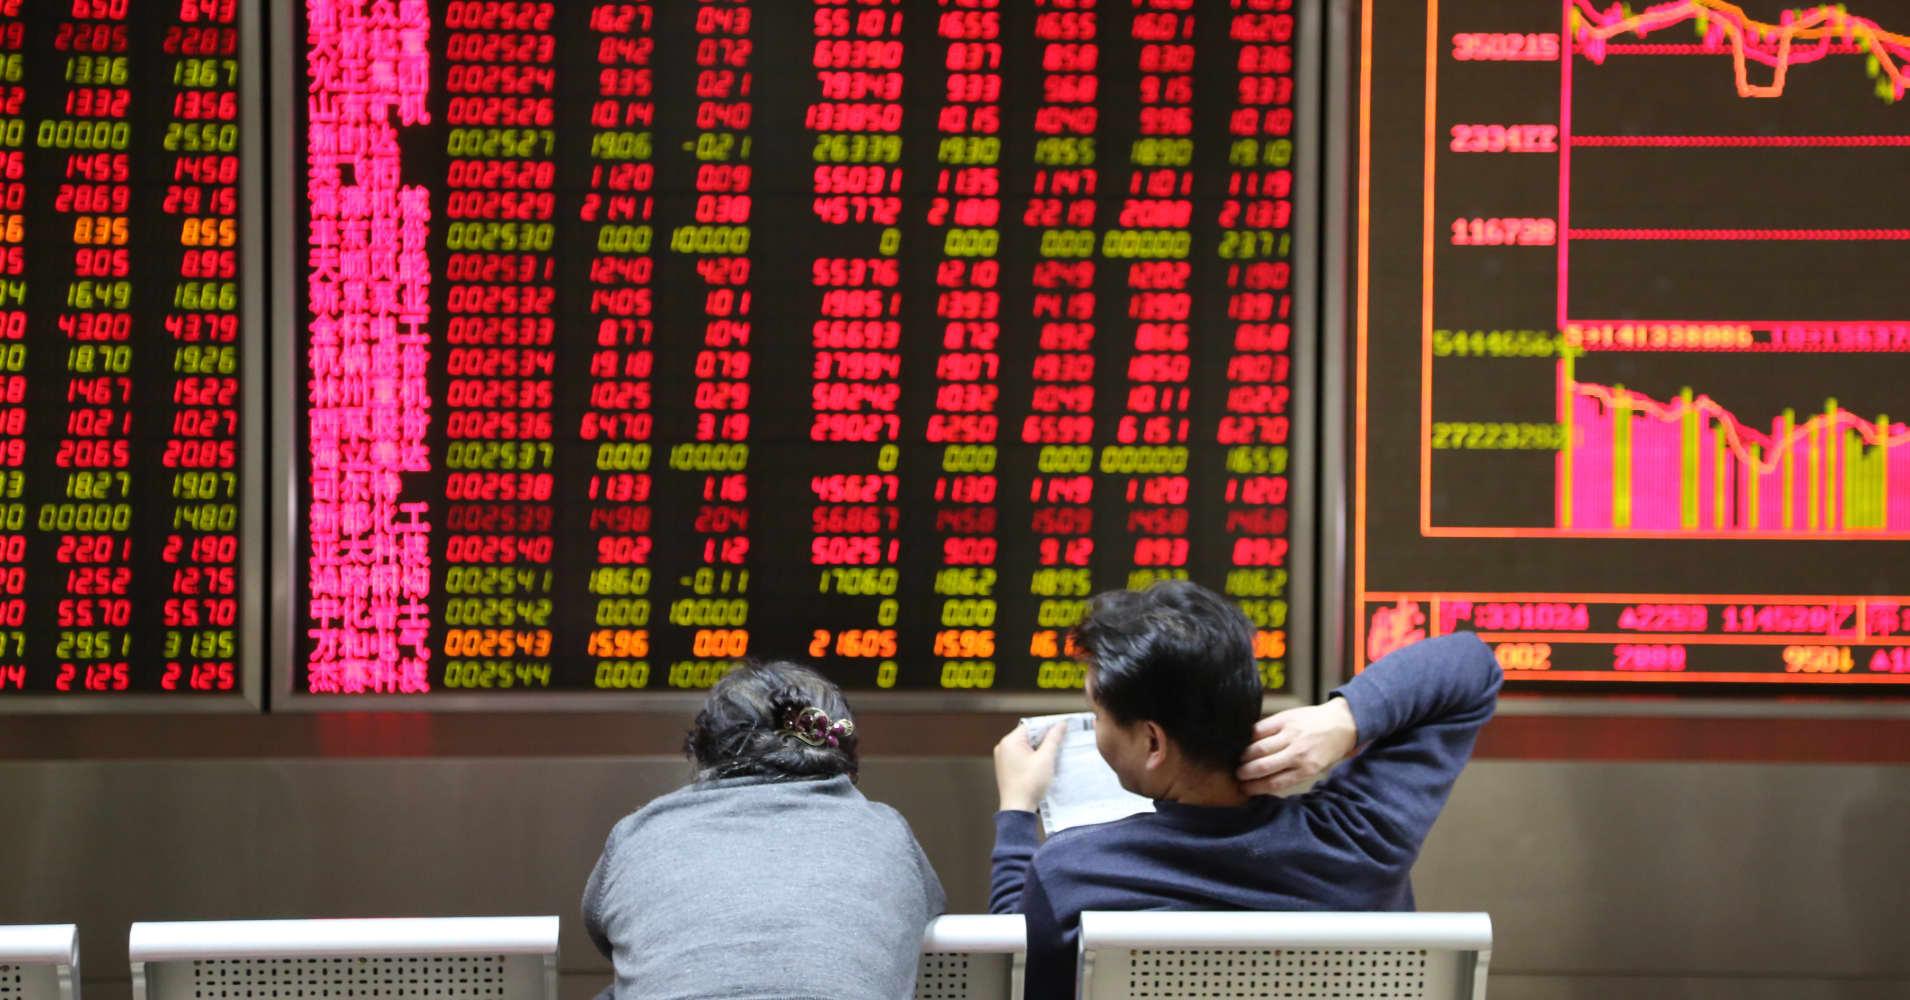 Chinese securities regulator to enhance market liquidity, encourage share buybacks